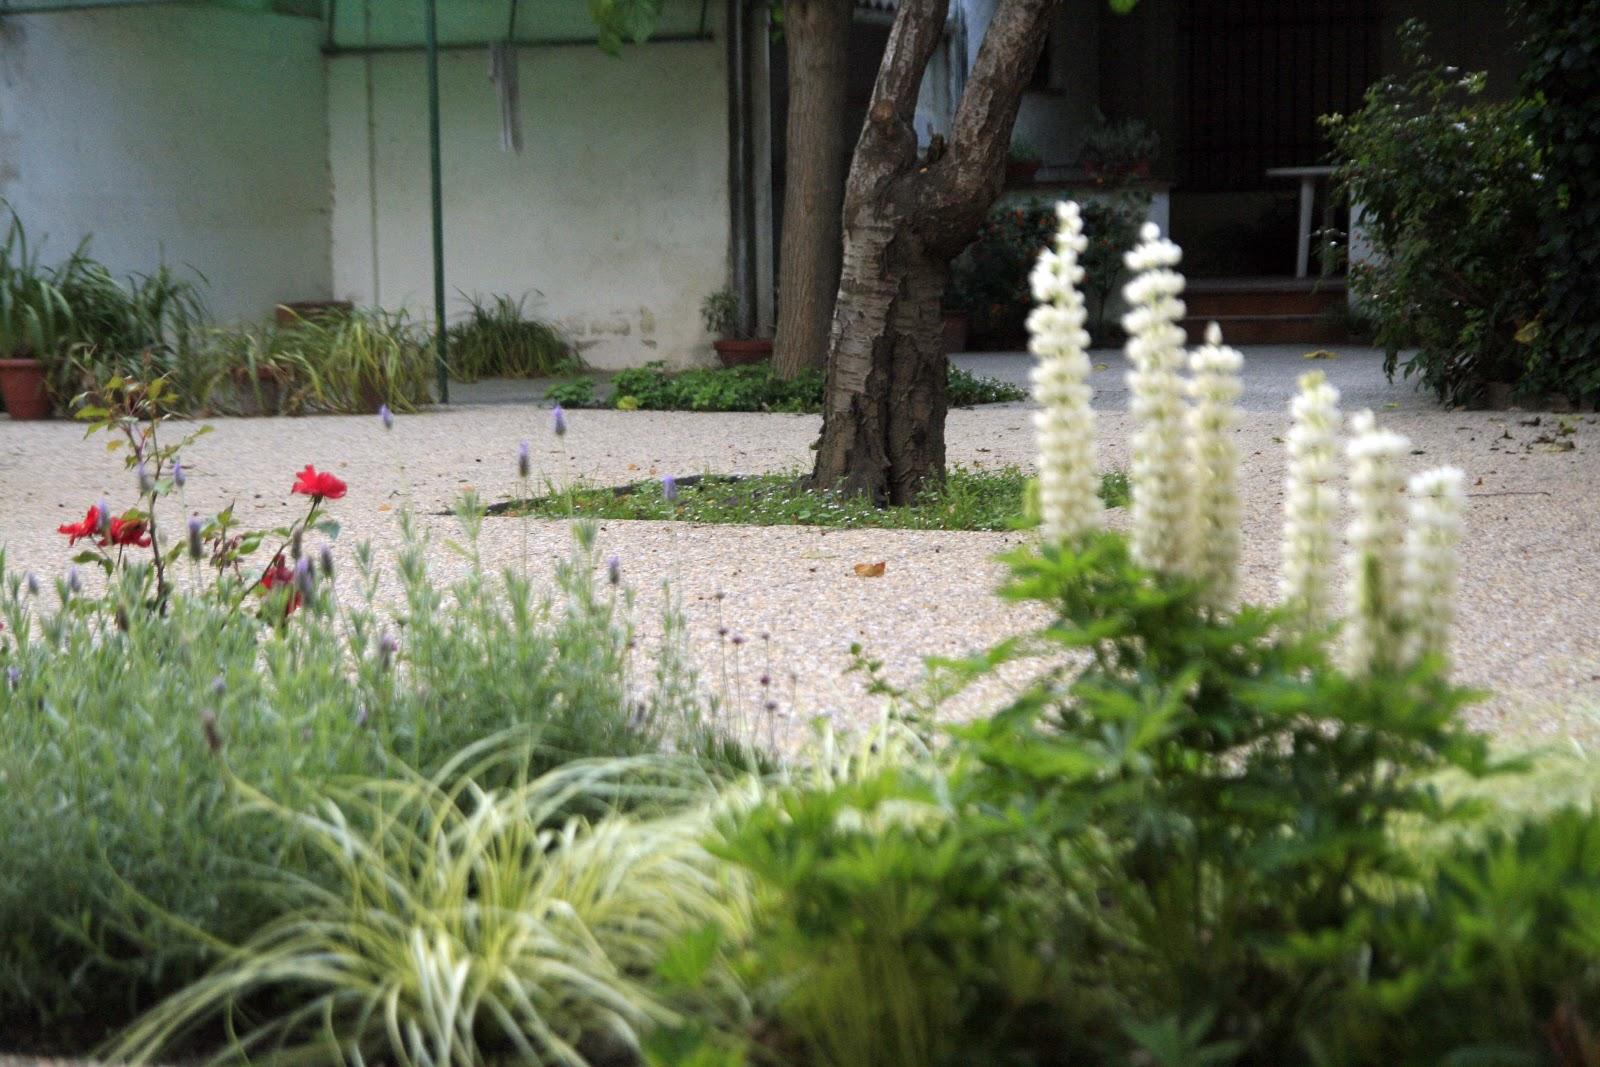 Jardinitis patio jard n mediterr neo - Disenador de jardines ...